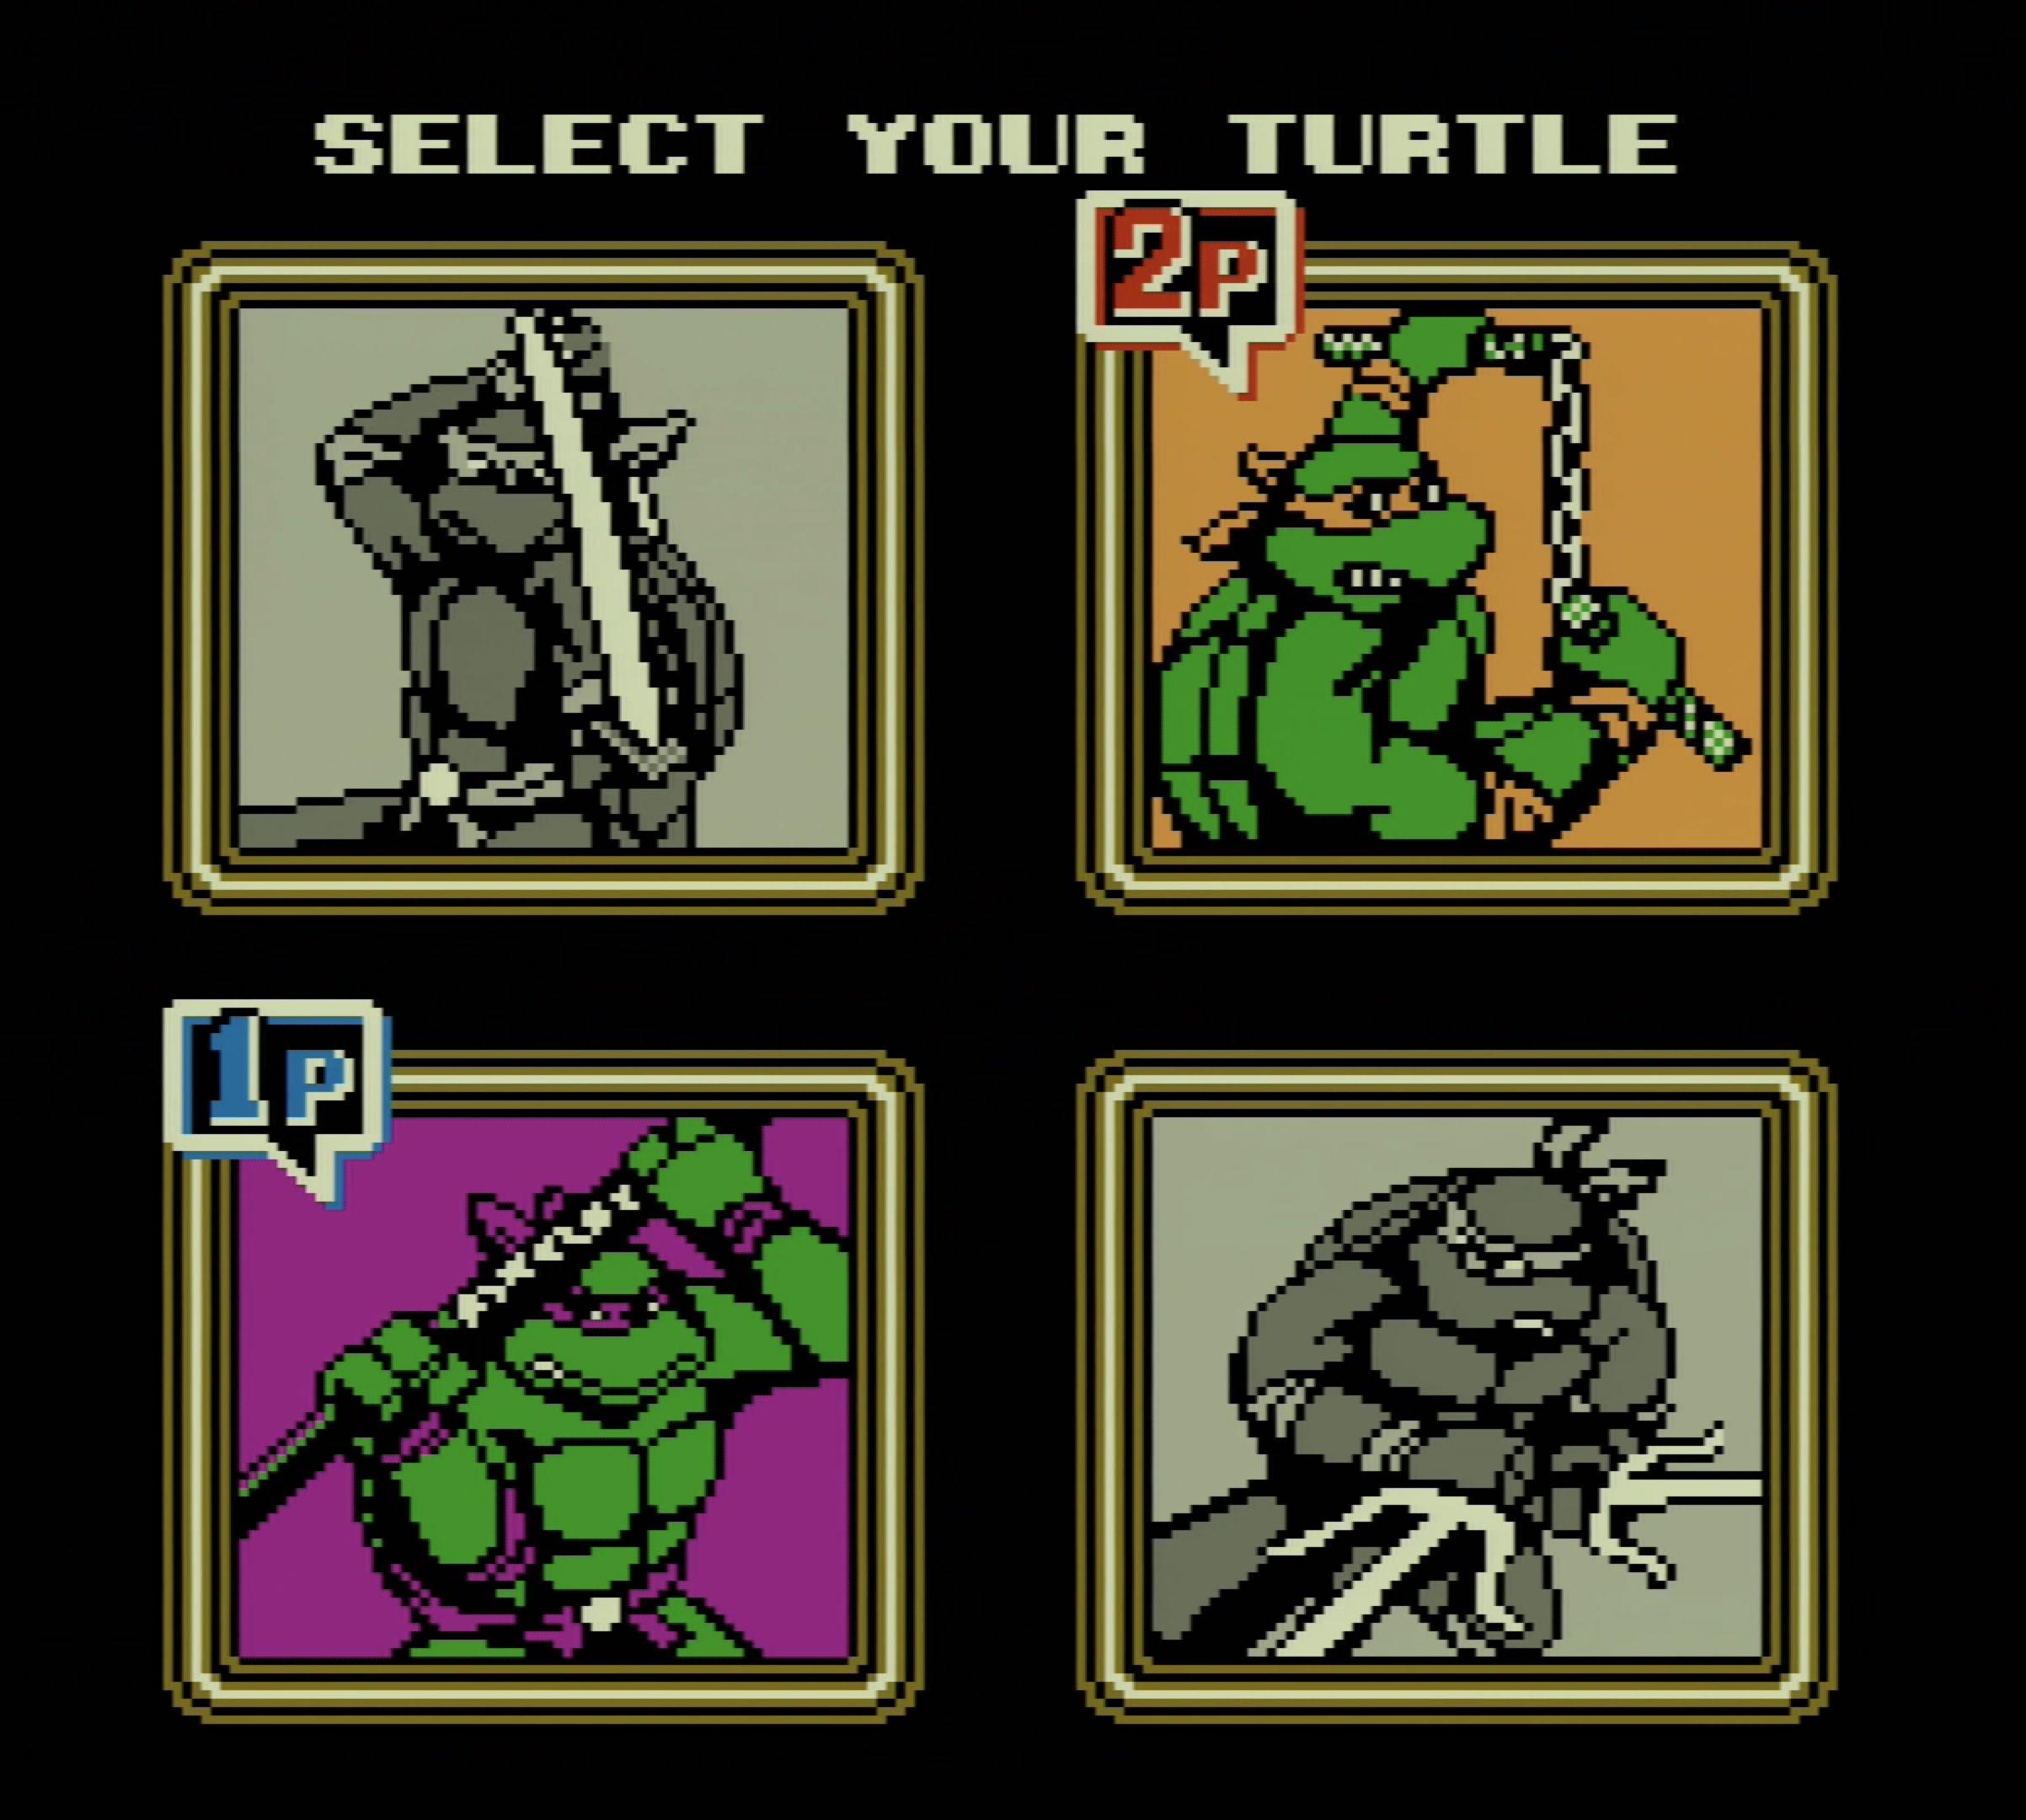 NES Review – TMNT: The Arcade Game – RetroGame Man